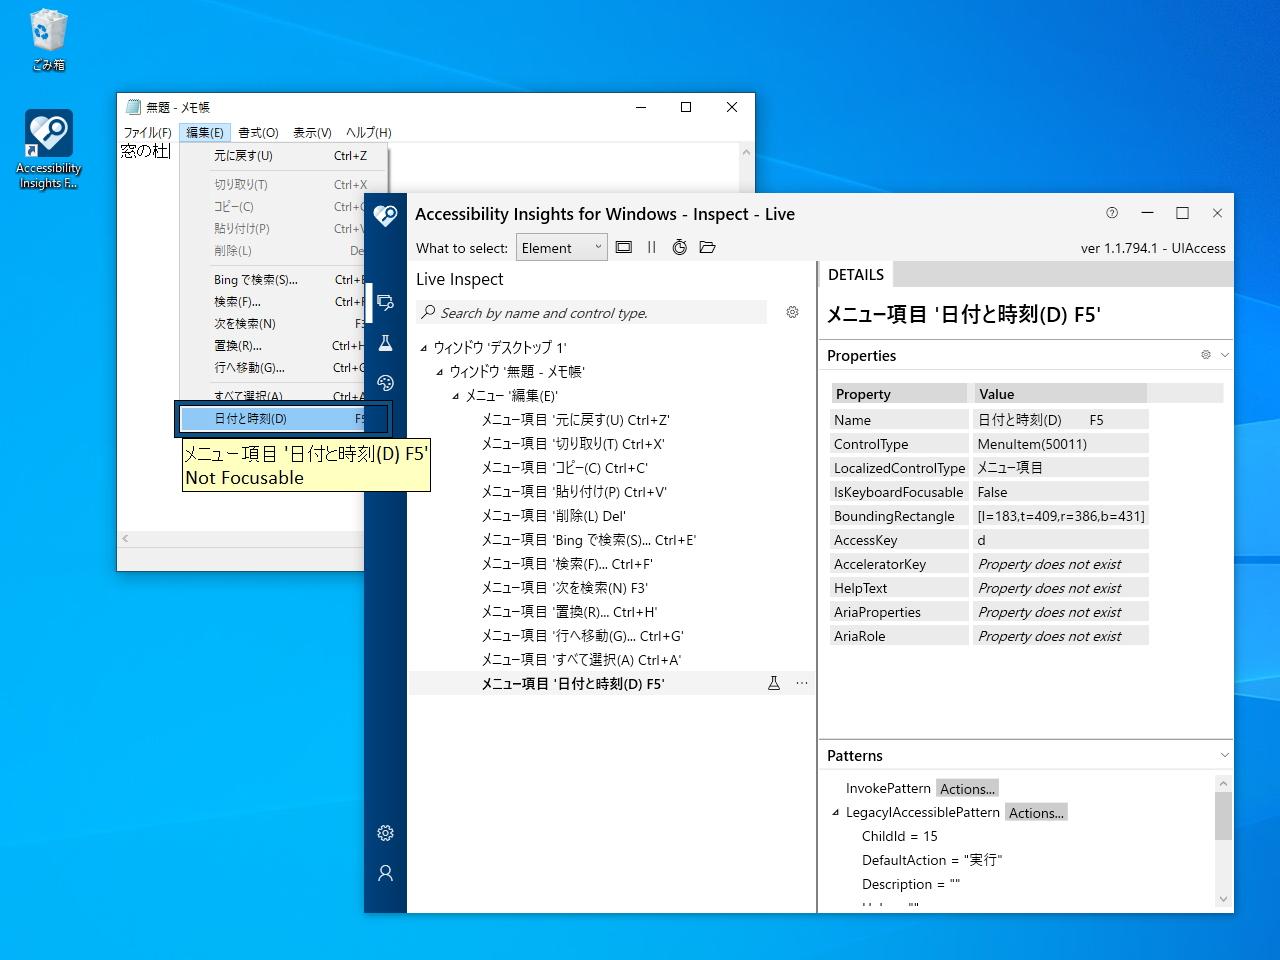 Windowsアプリを調査するスタンドアロンのネイティブアプリ